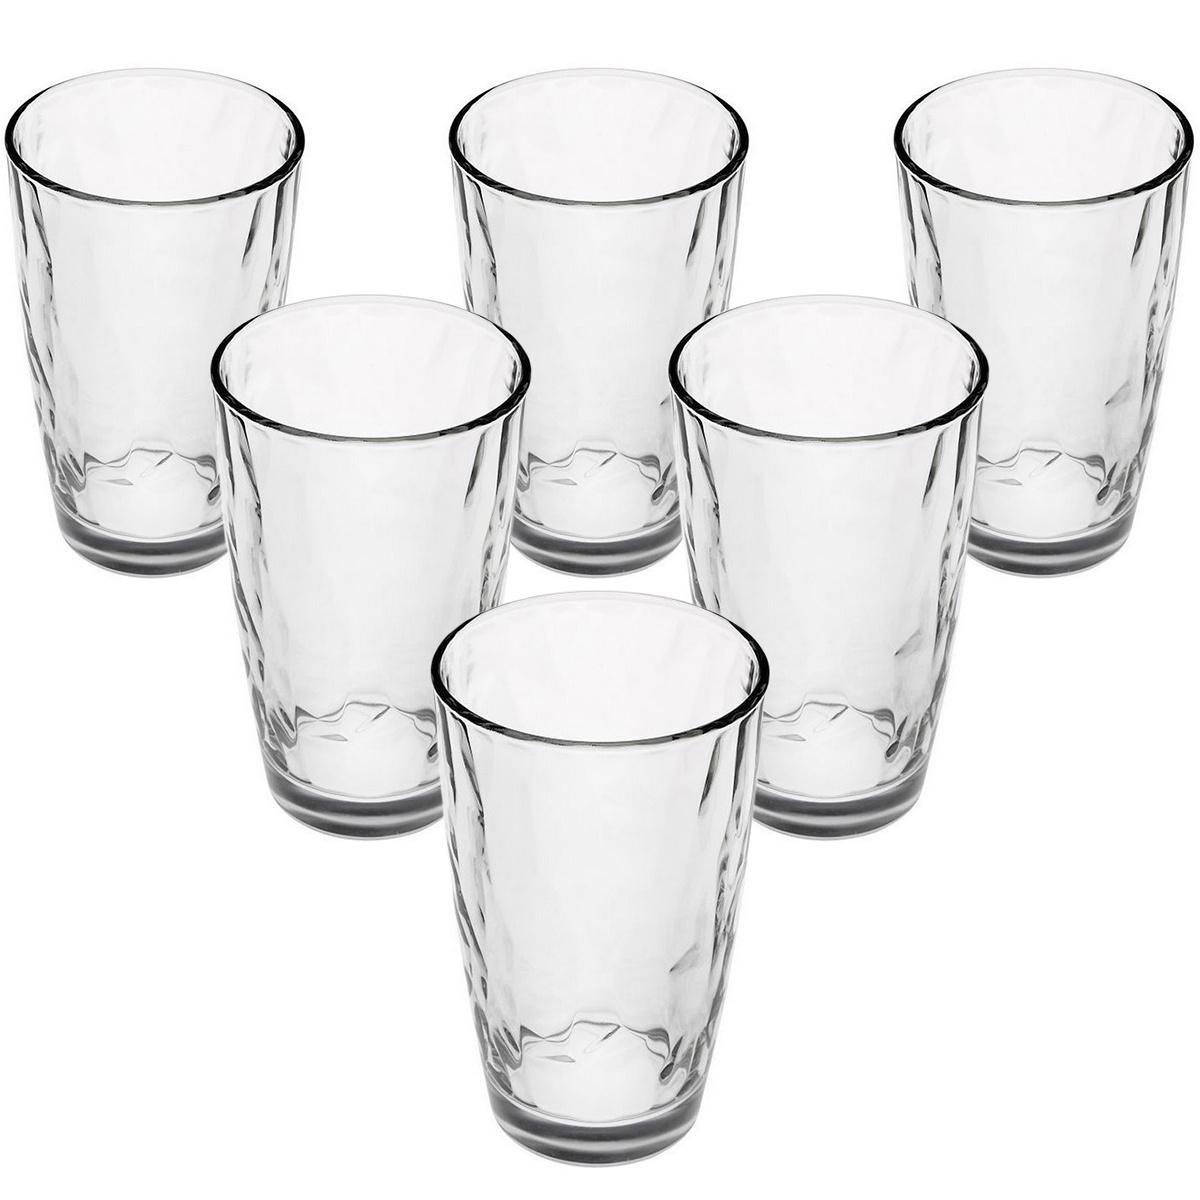 Bormioli Rocco 6dílná sada sklenic na long drink Kaleido, 370 ml